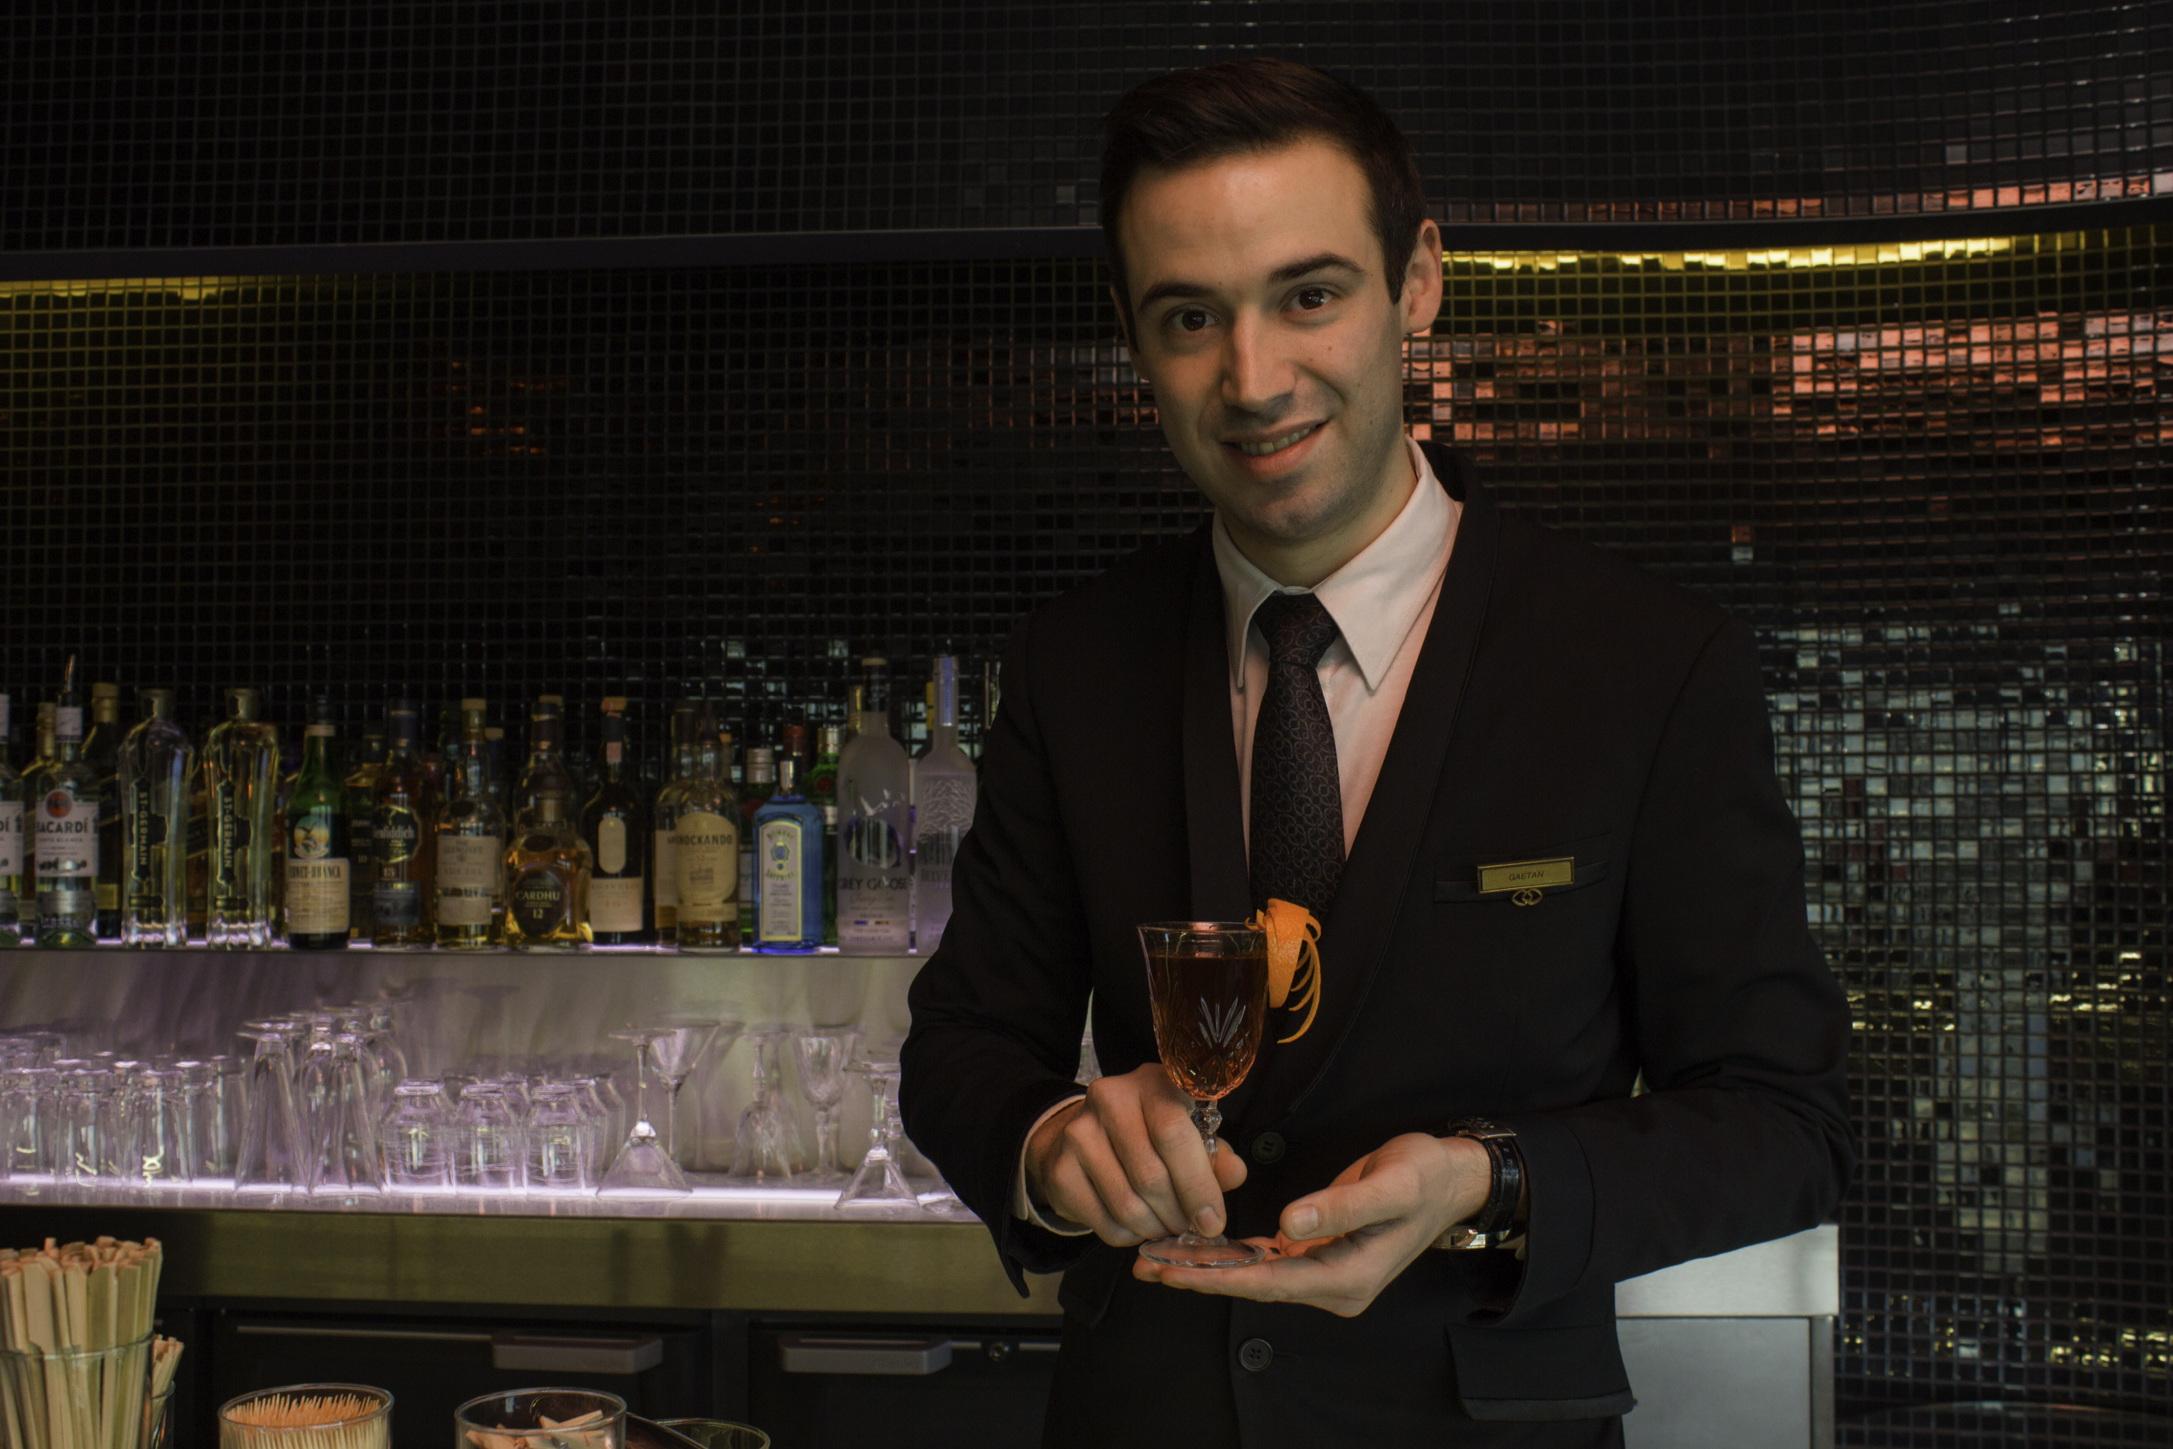 Bartenders at work by Infosbar : le CV express de Gaetan Costecalde